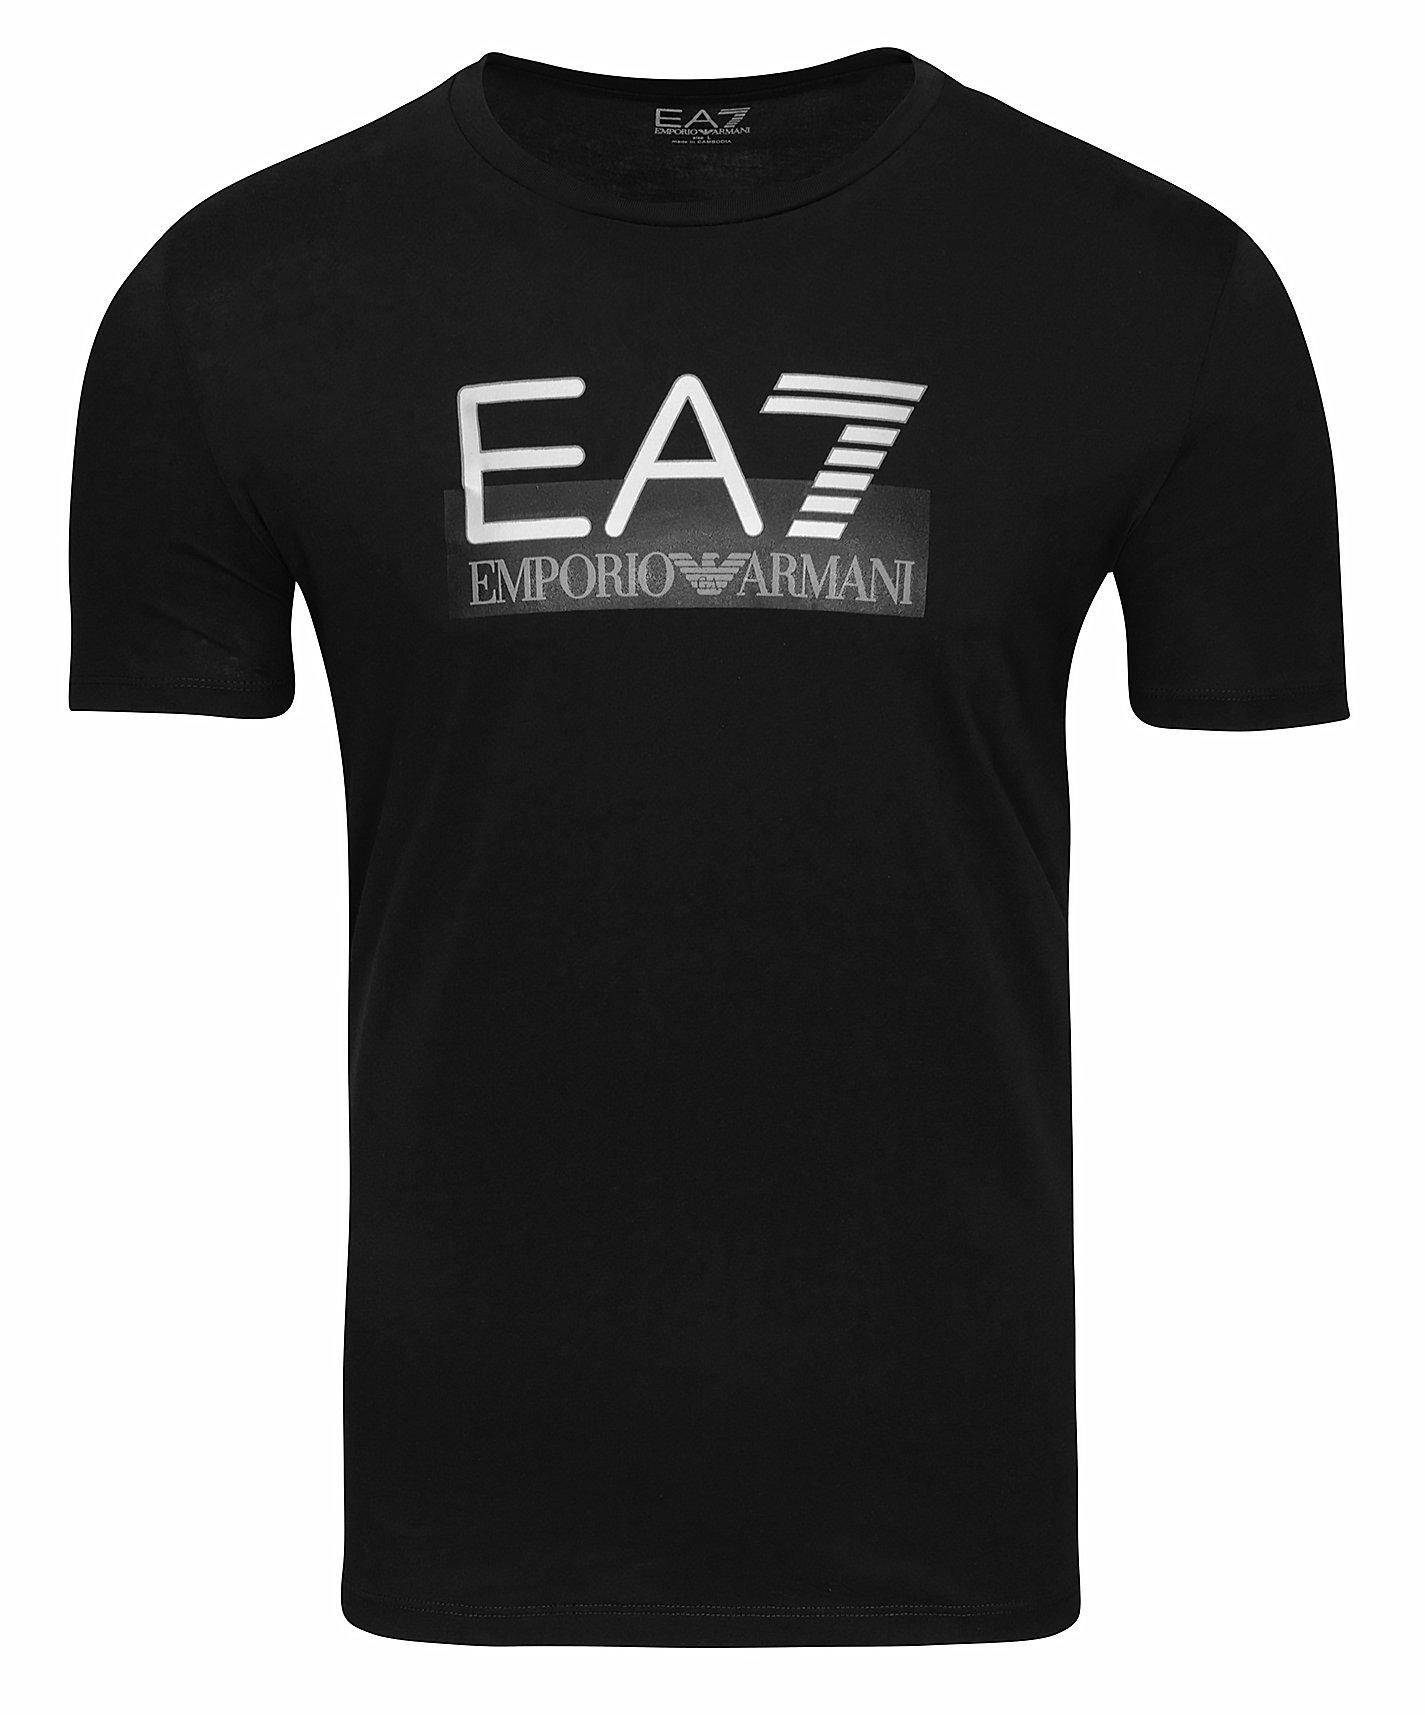 Emporio Armani | Bluzy | Męskie Zantalo.pl